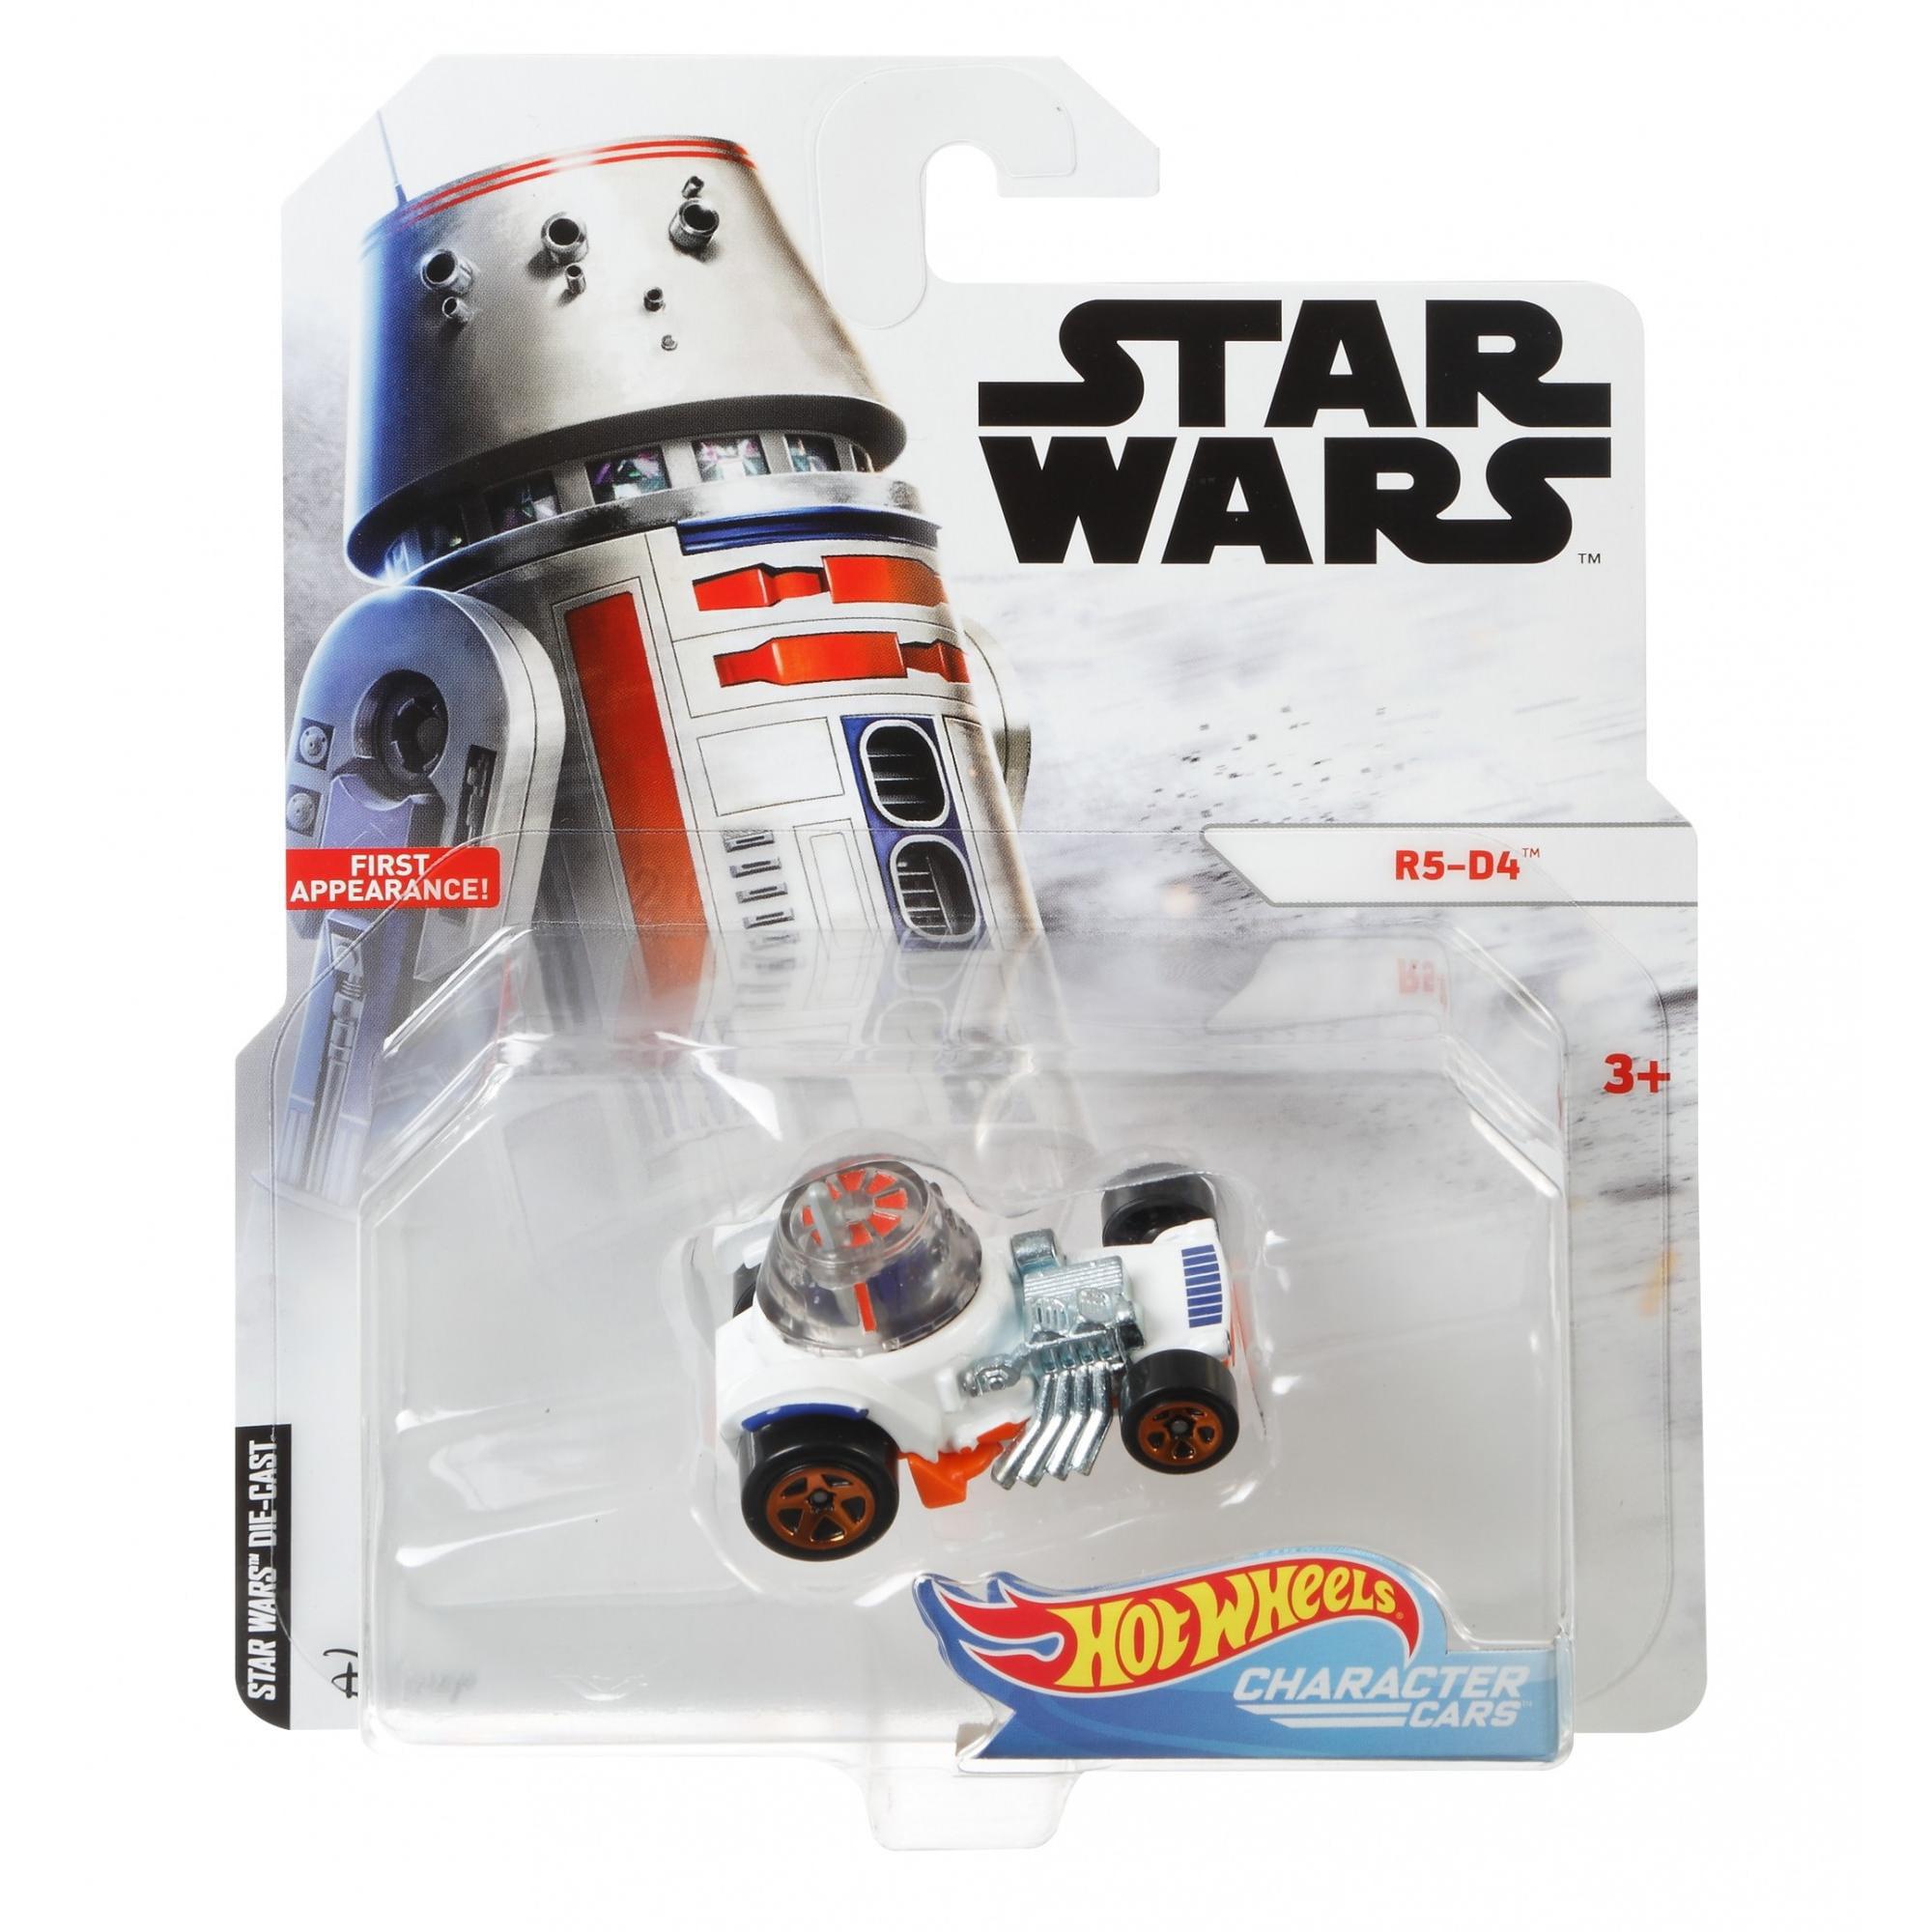 Star Wars Character Cars Hot Wheels R5-D4 2019